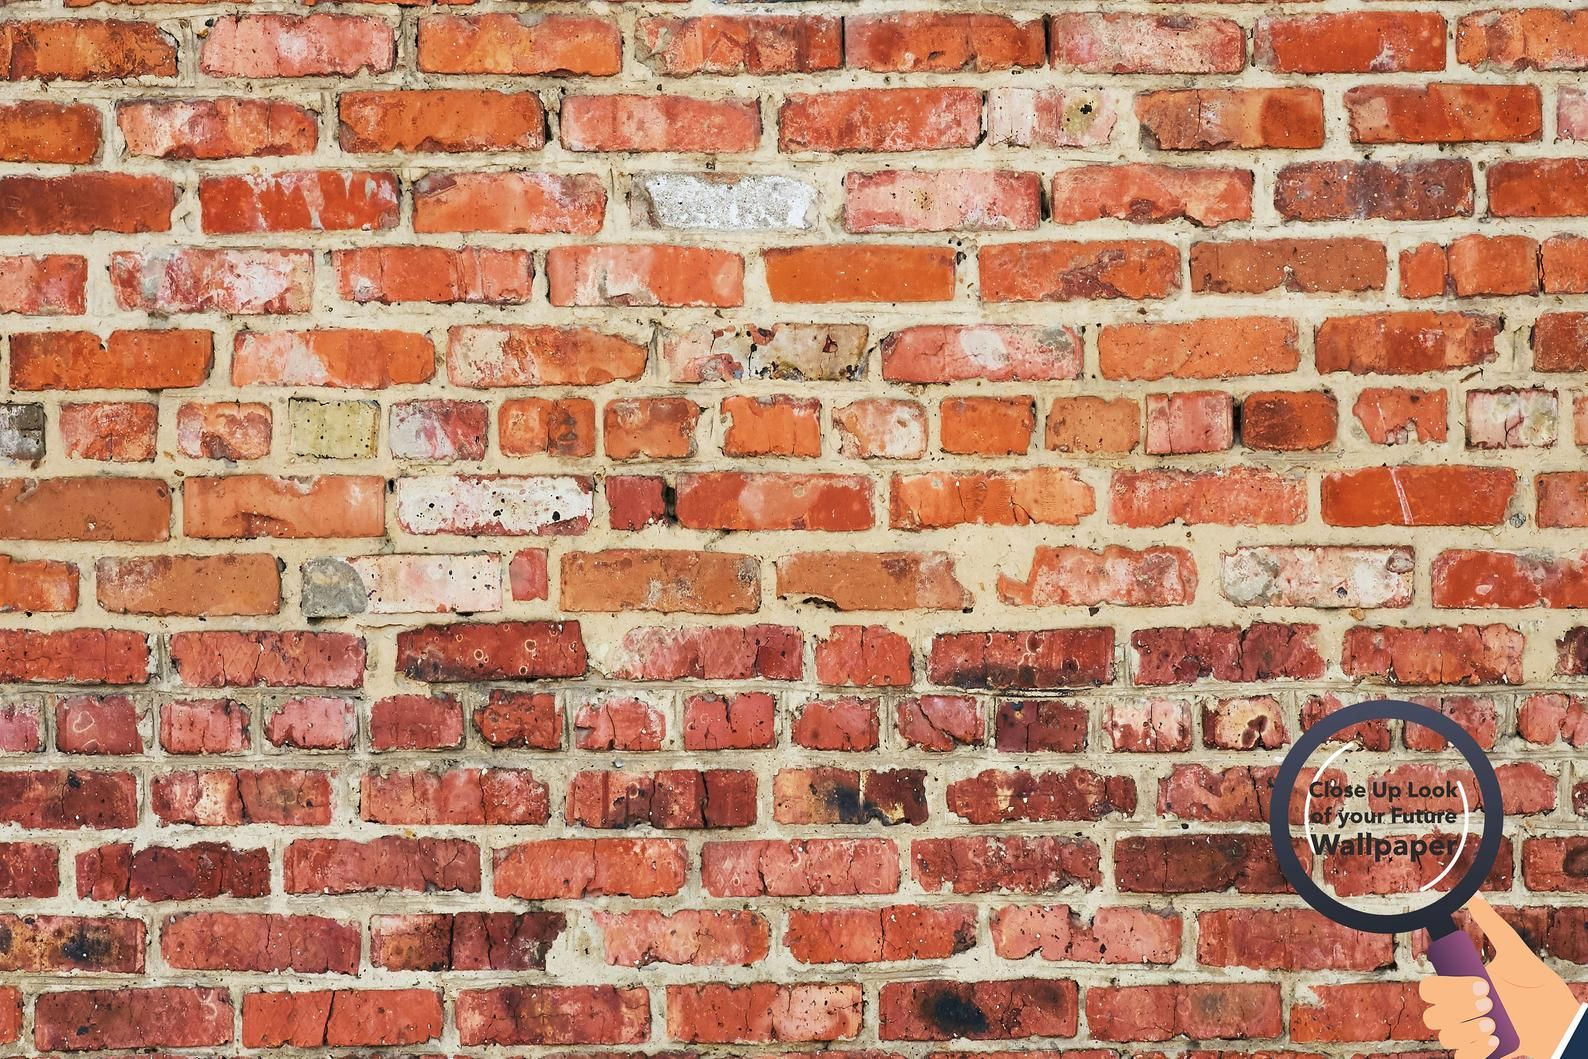 Red Brick Wall Texture Wallpaper Rustic Texture Brick Peel And Stick Self Adhesive Wallpaper Murals By Welovewallz In 2020 Textured Wallpaper Red Bricks Textured Walls